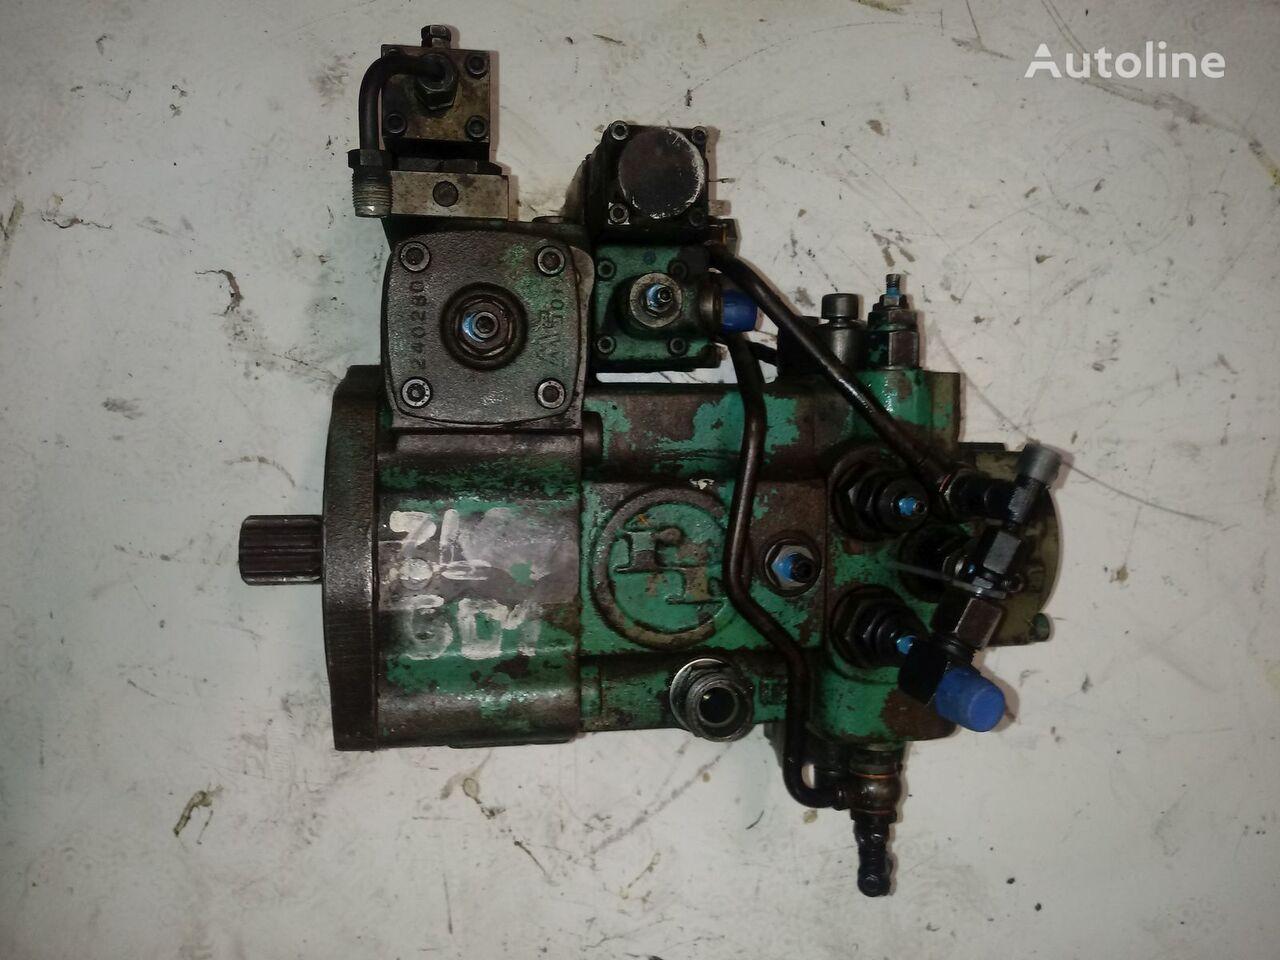 Hydromatik A4V.56.DA.10.R.00.1A10 Hydraulic pump hydraulic engin hidrauliskais sūknis paredzēts frontāla iekrāvēja